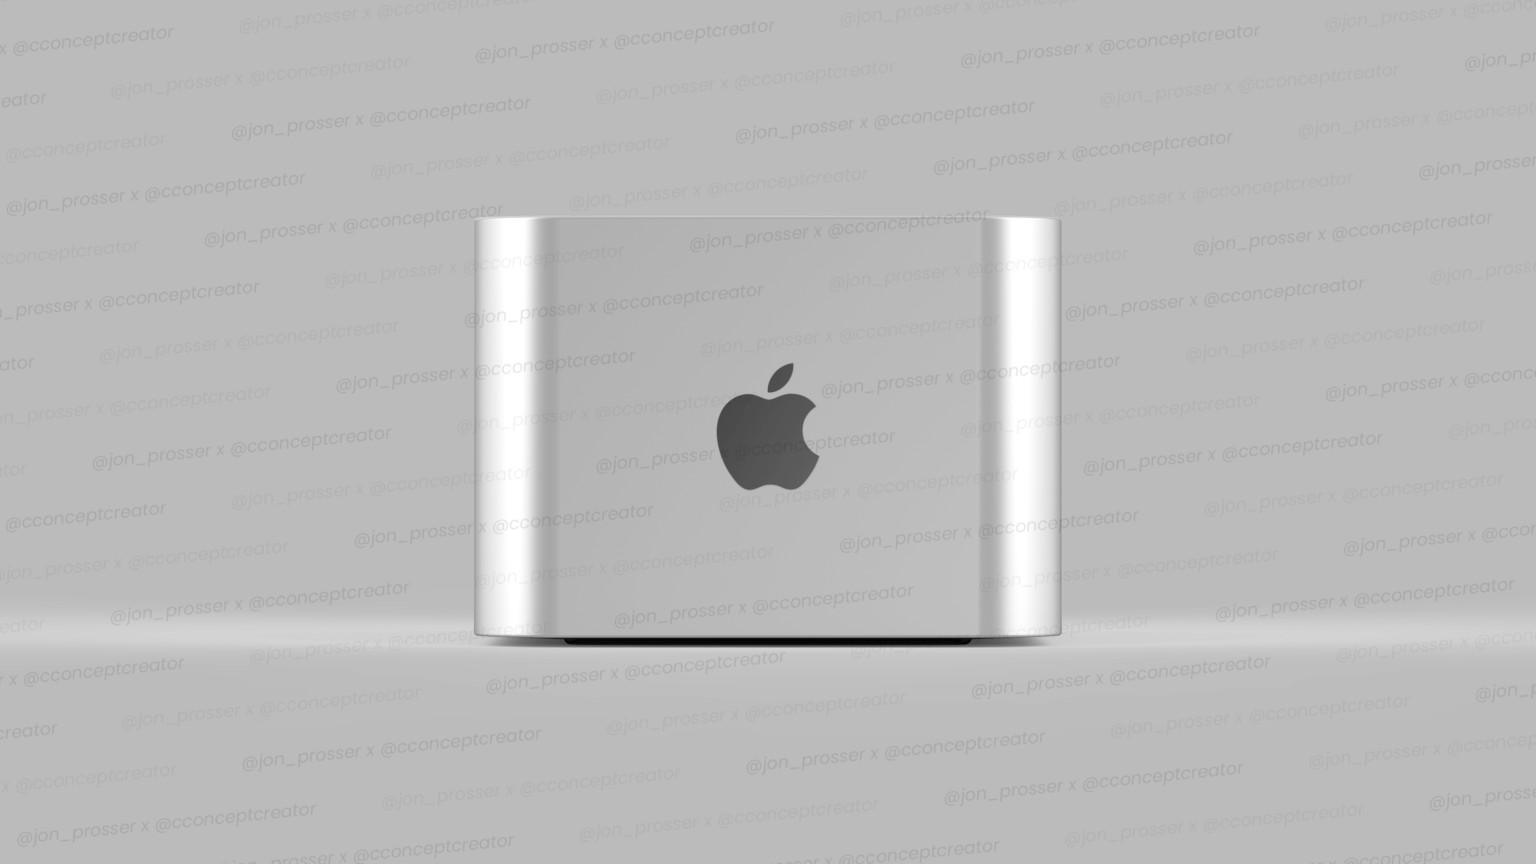 Concepto de diseño de Mac Pro mini